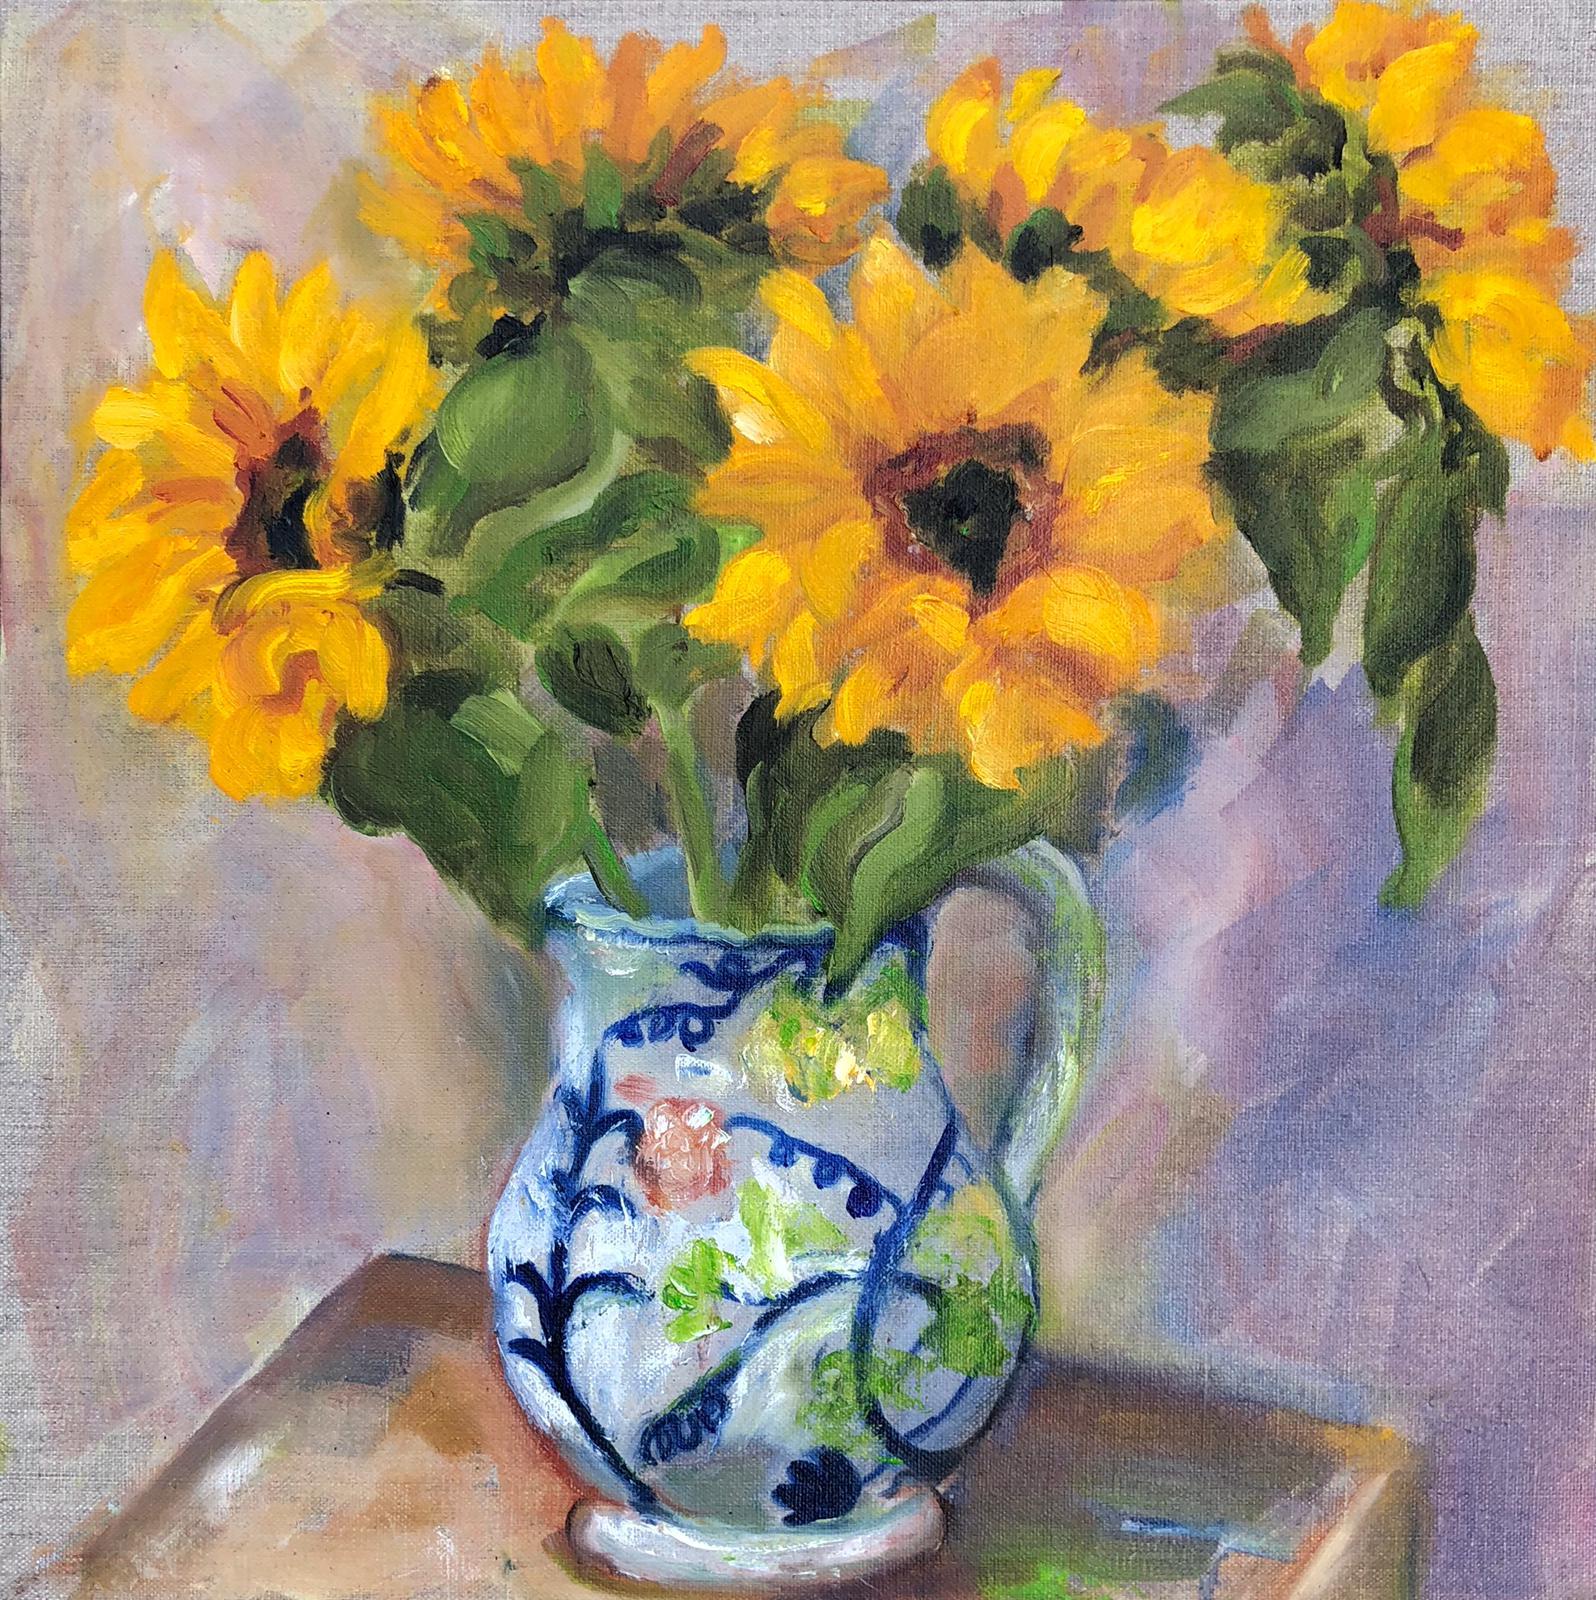 Christine Klein Cinq tournesols oil on canvas panel 44x44cm £695.JPG